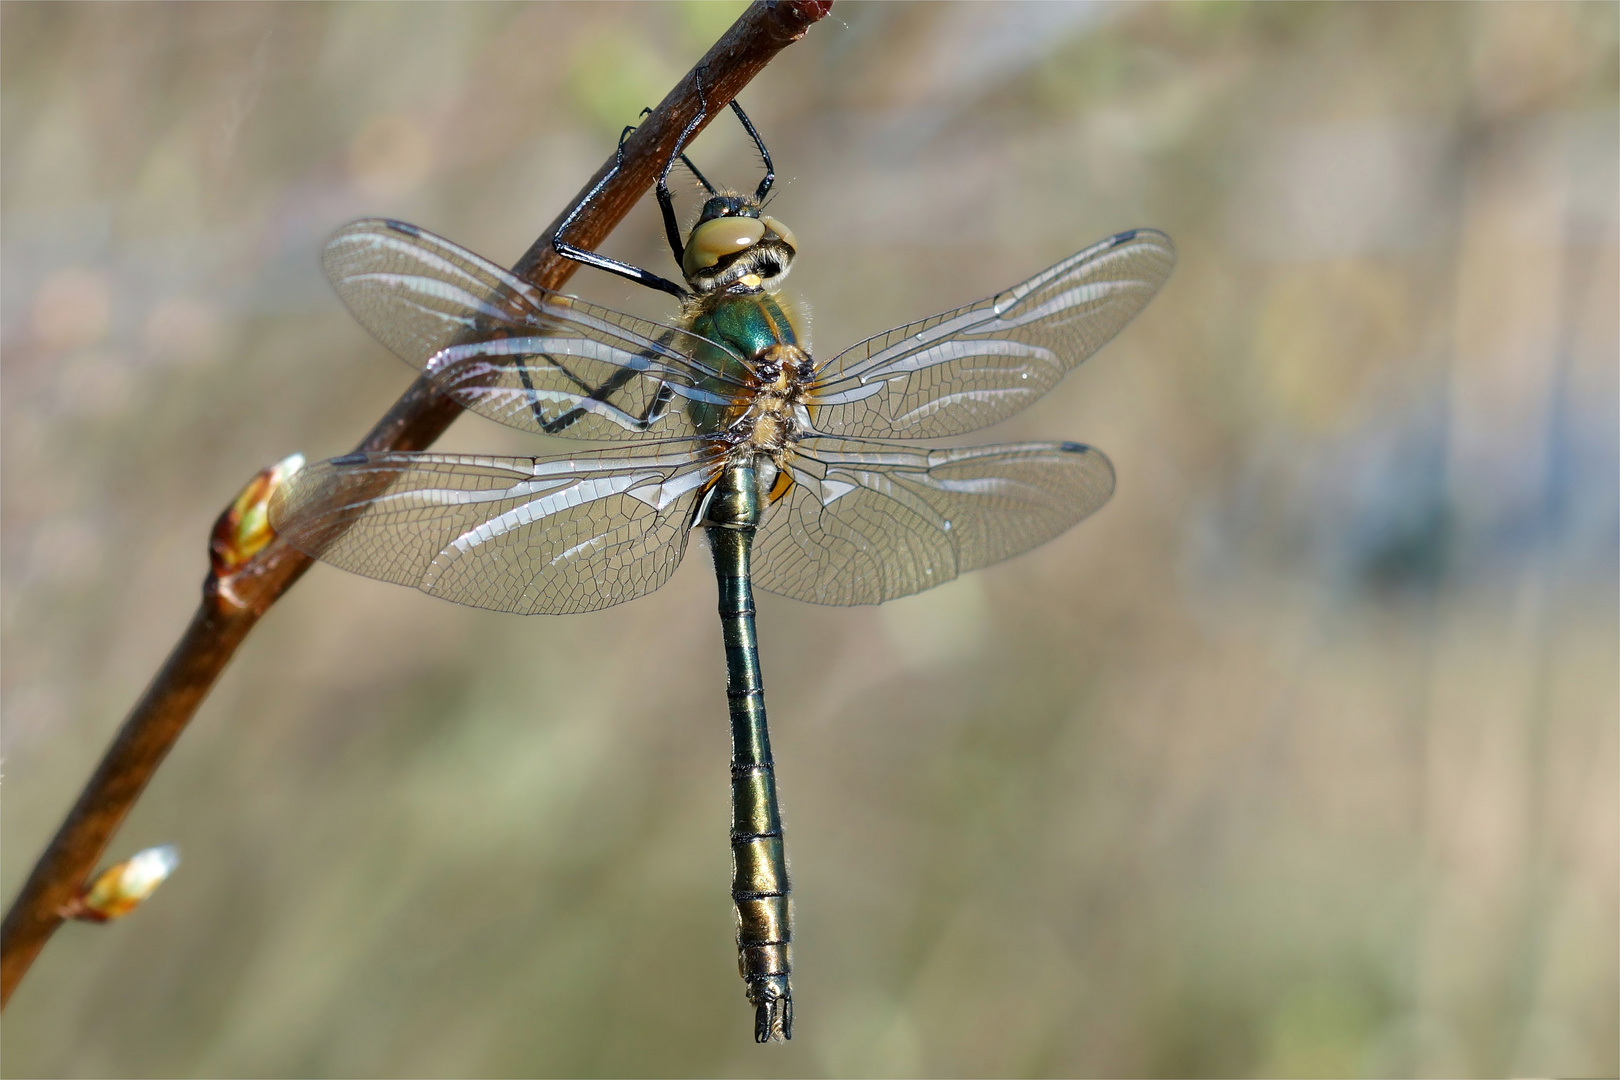 Gemeine Smaragdlibelle - Falkenlibelle -